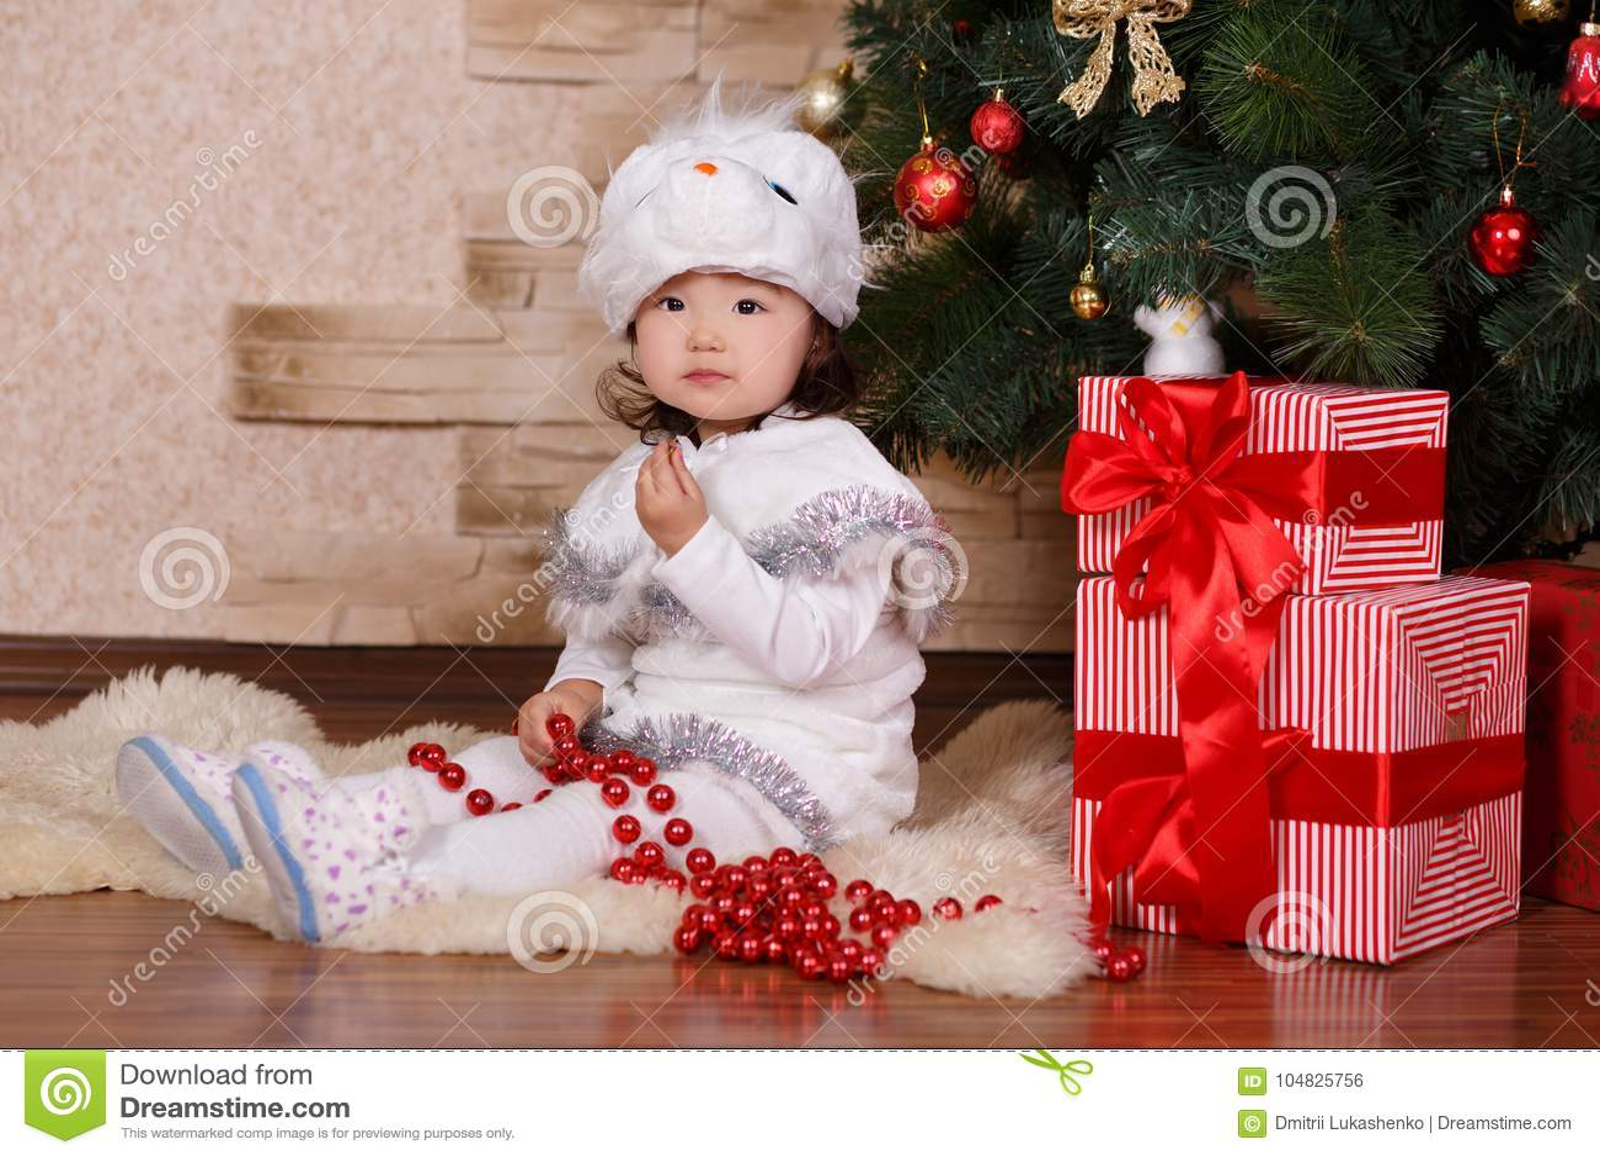 50848197009ec Asian little cute girl wearing casual dress posing close to new year  christmas green classic tree